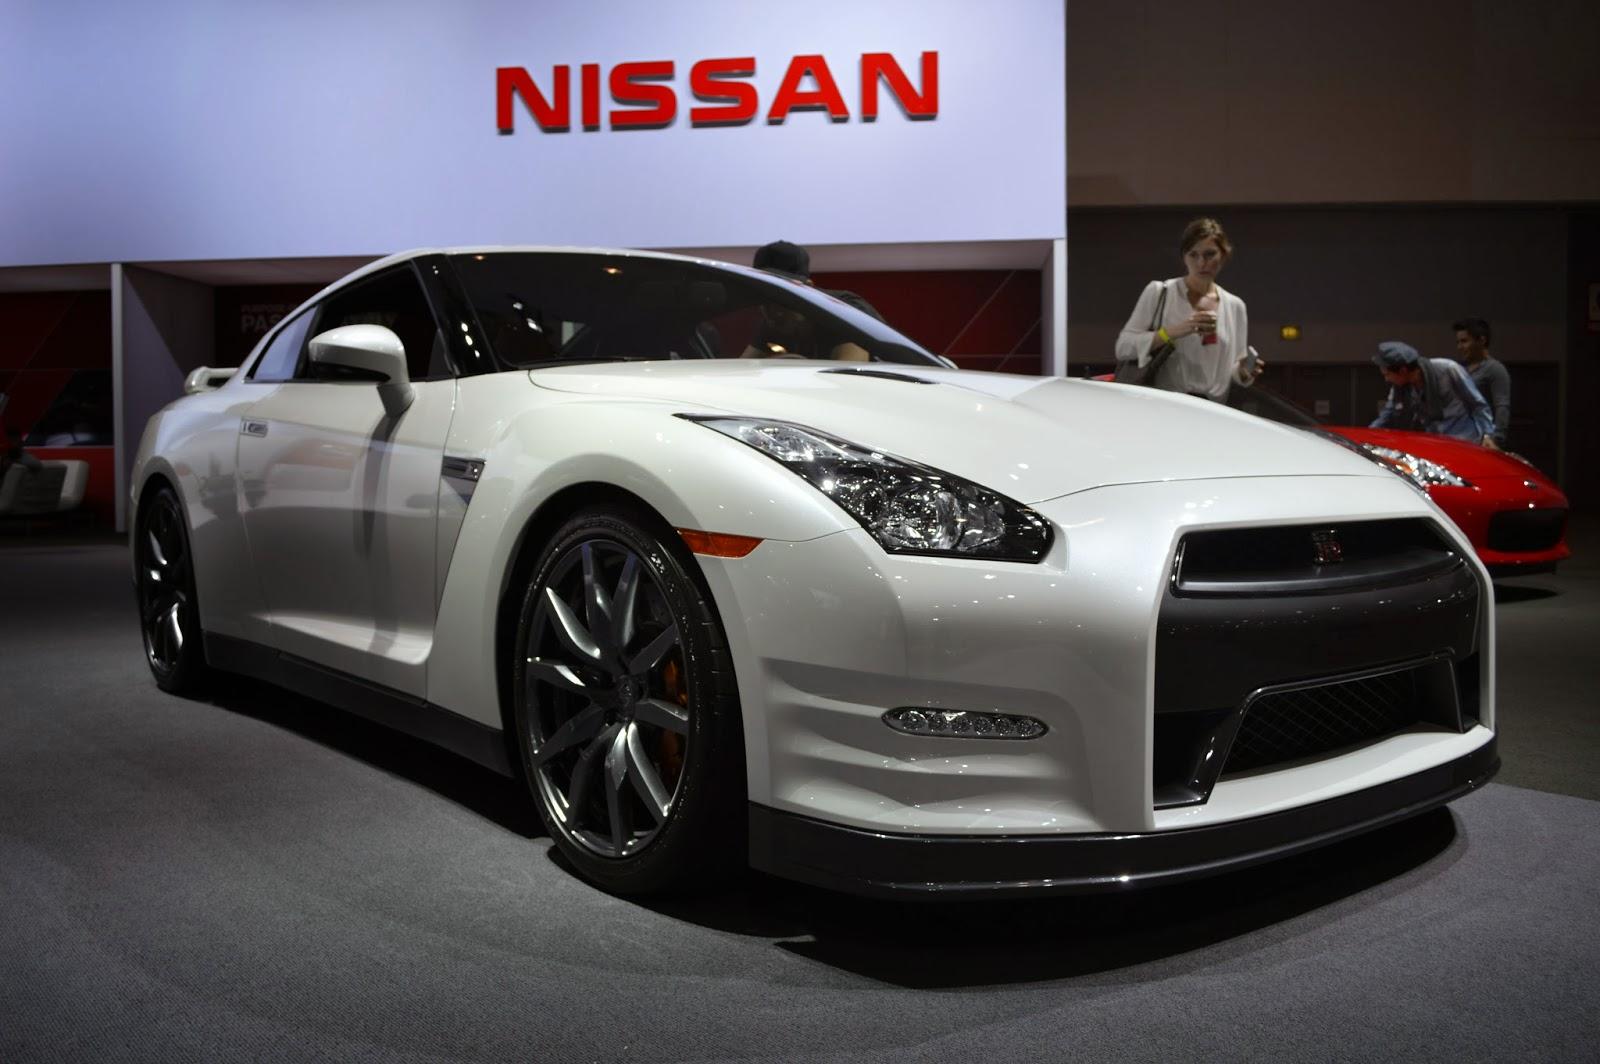 Nissan nissan gtr 2014 : Used Nissan GT-R Buyers Guide - 2009 - 2015 - 2009gtr.com